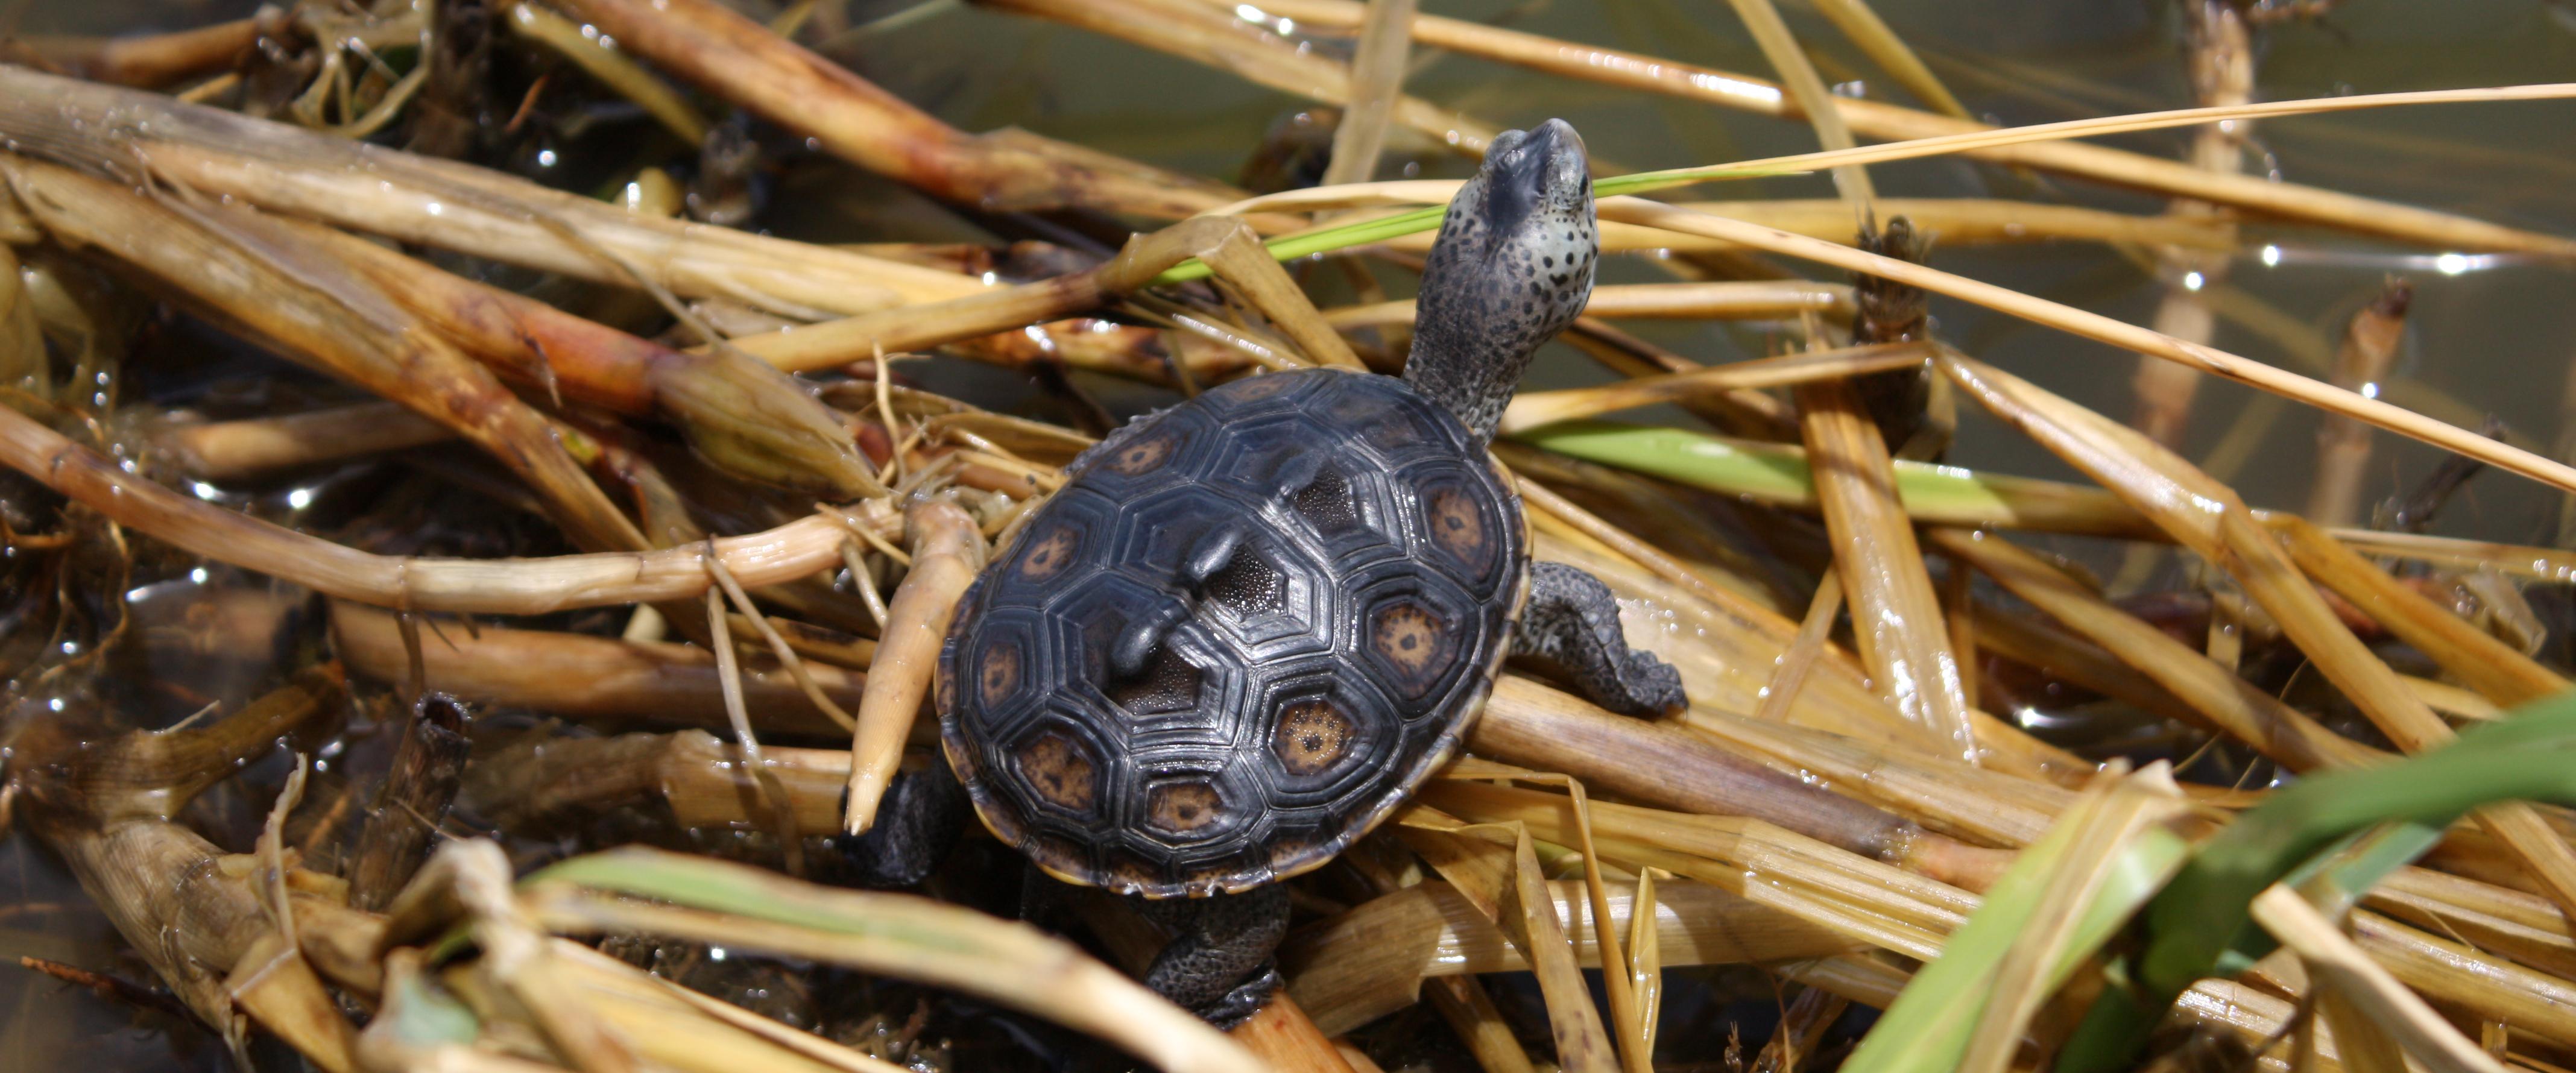 Terrapins Released on Restored Louisiana Barrier Island